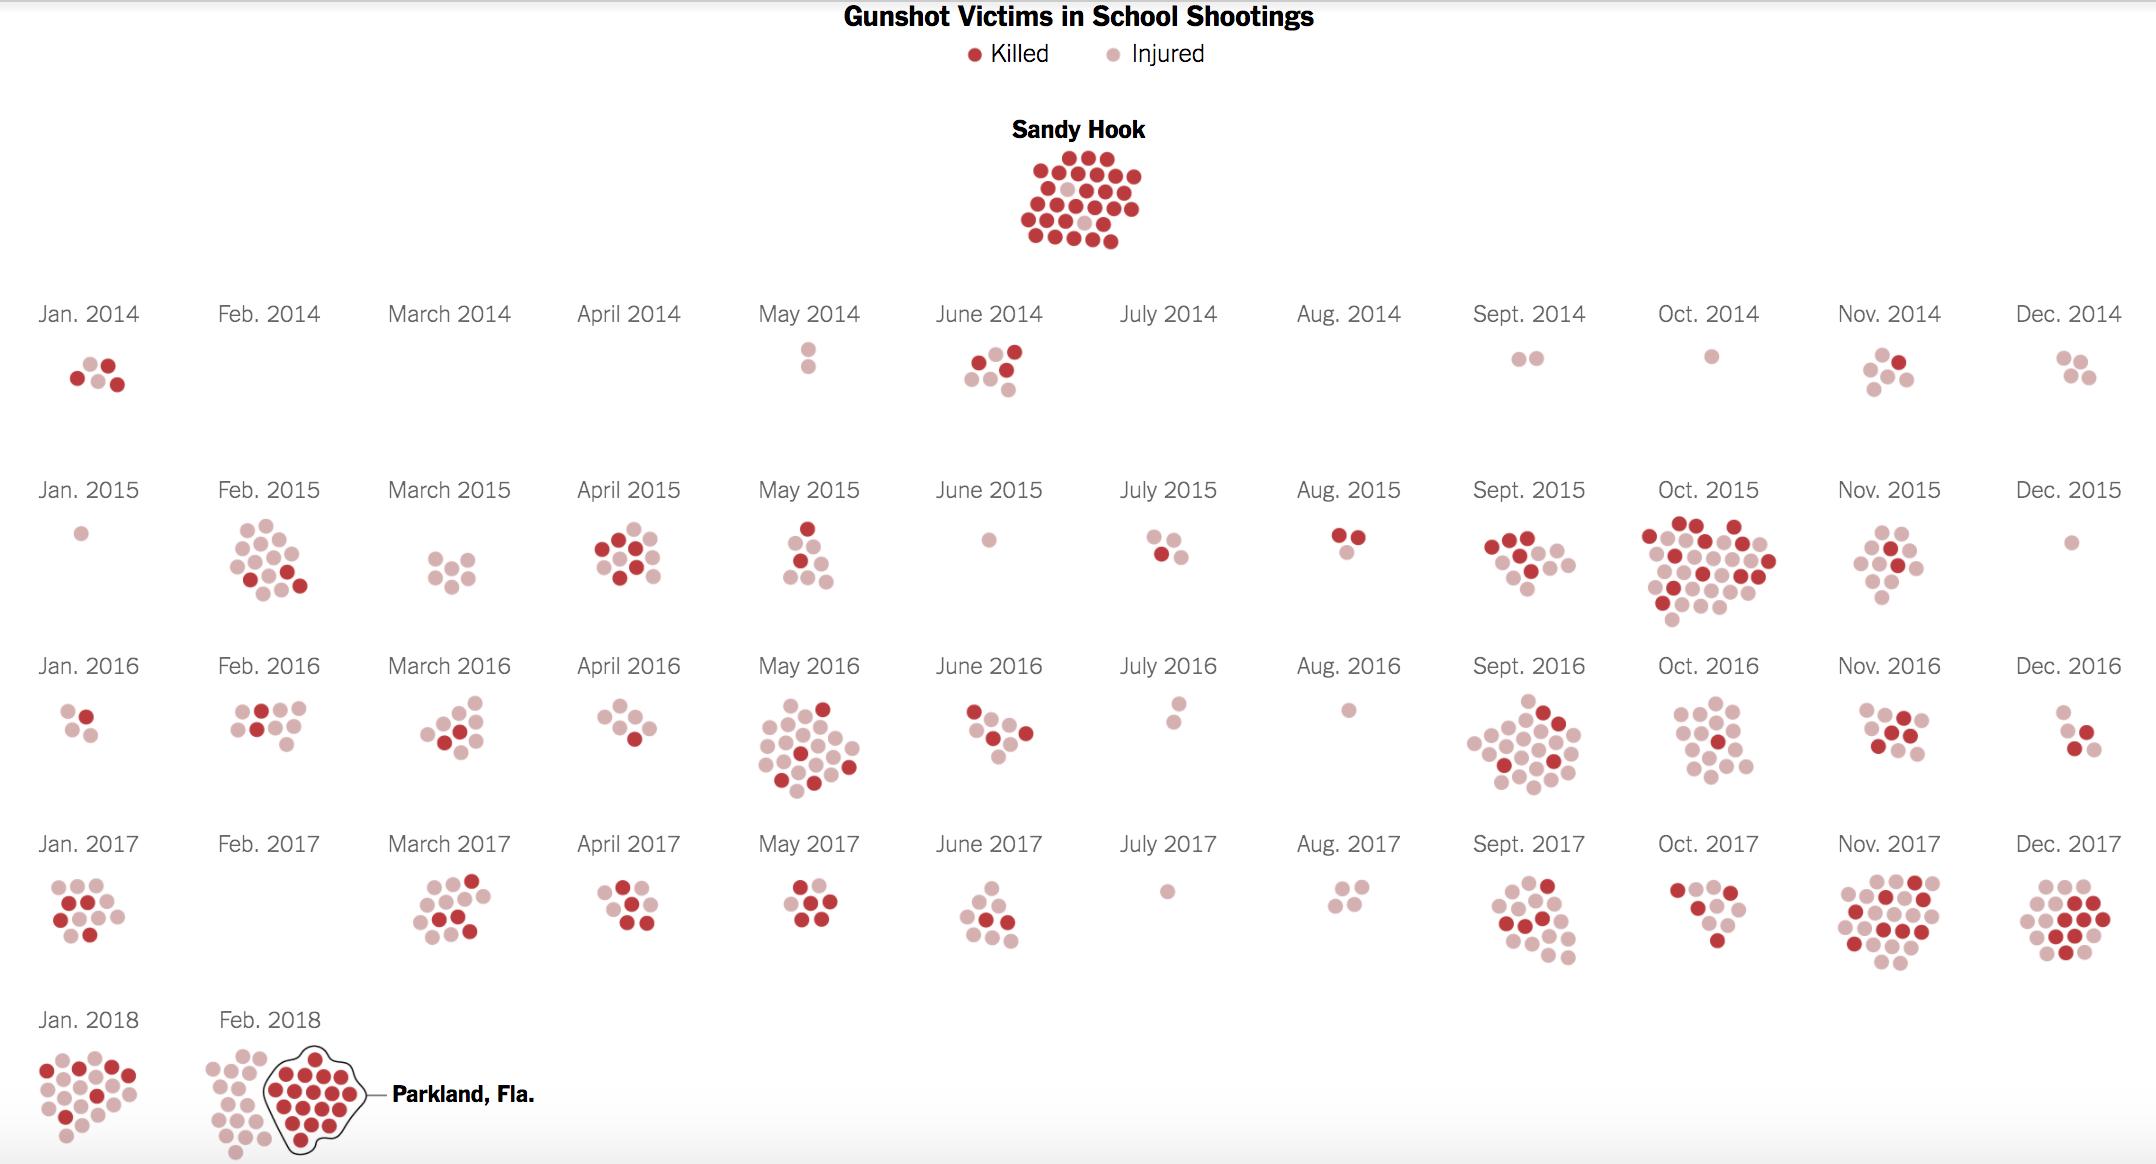 America 1966 Statistics School Shooting 2012